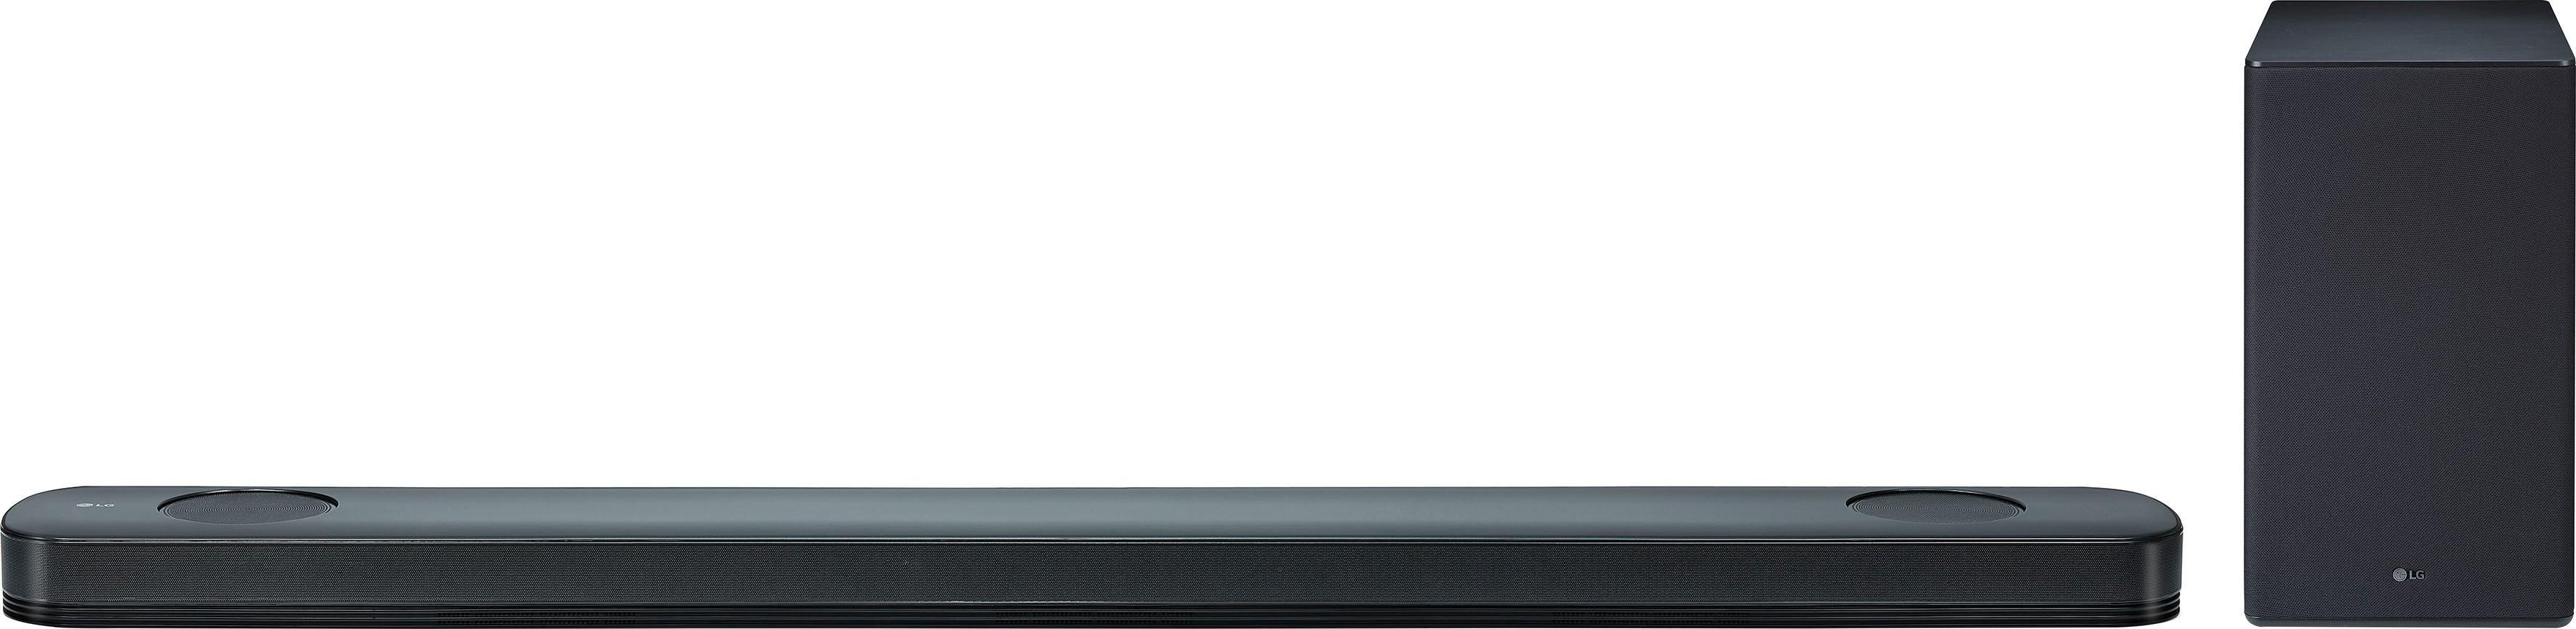 LG »SK9Y« soundbar (bluetooth, wifi, LAN (ethernet), Hi-Res, Chromecast, Google Assistant, 550 W) nu online kopen bij OTTO